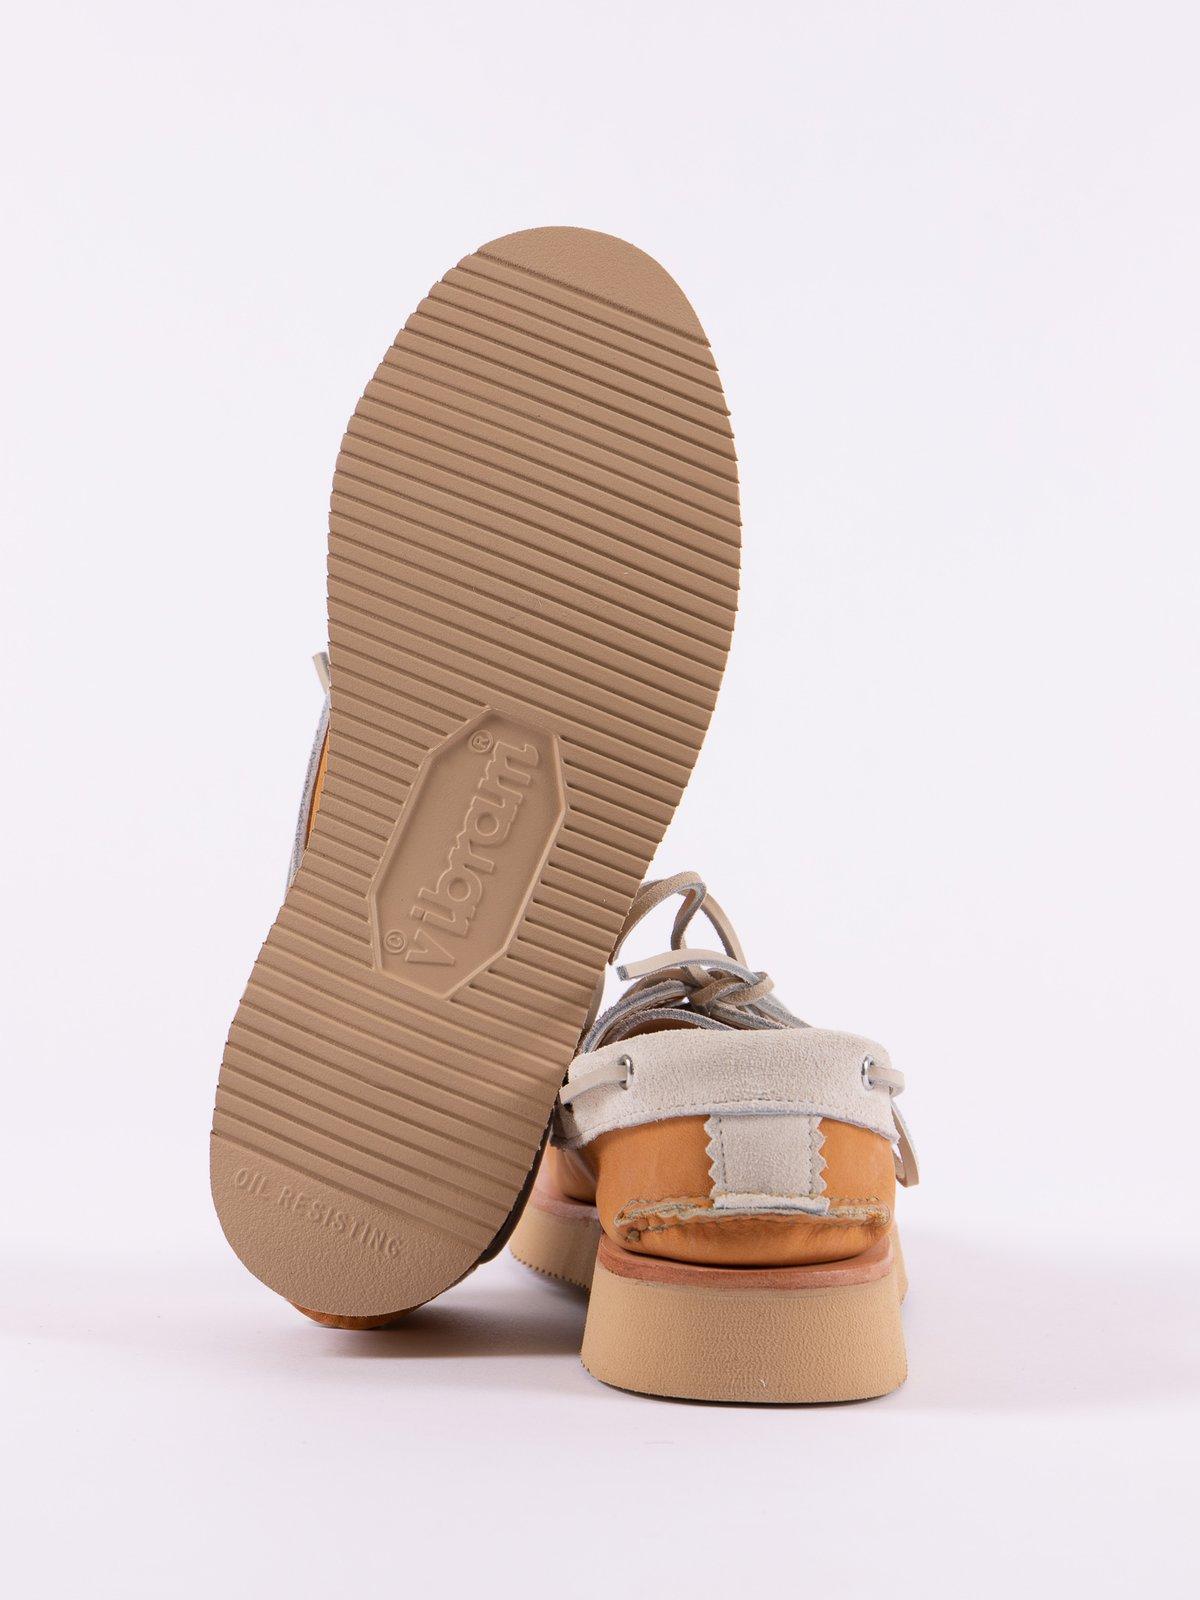 BB Tan/FO White Boat Shoe Exclusive - Image 5